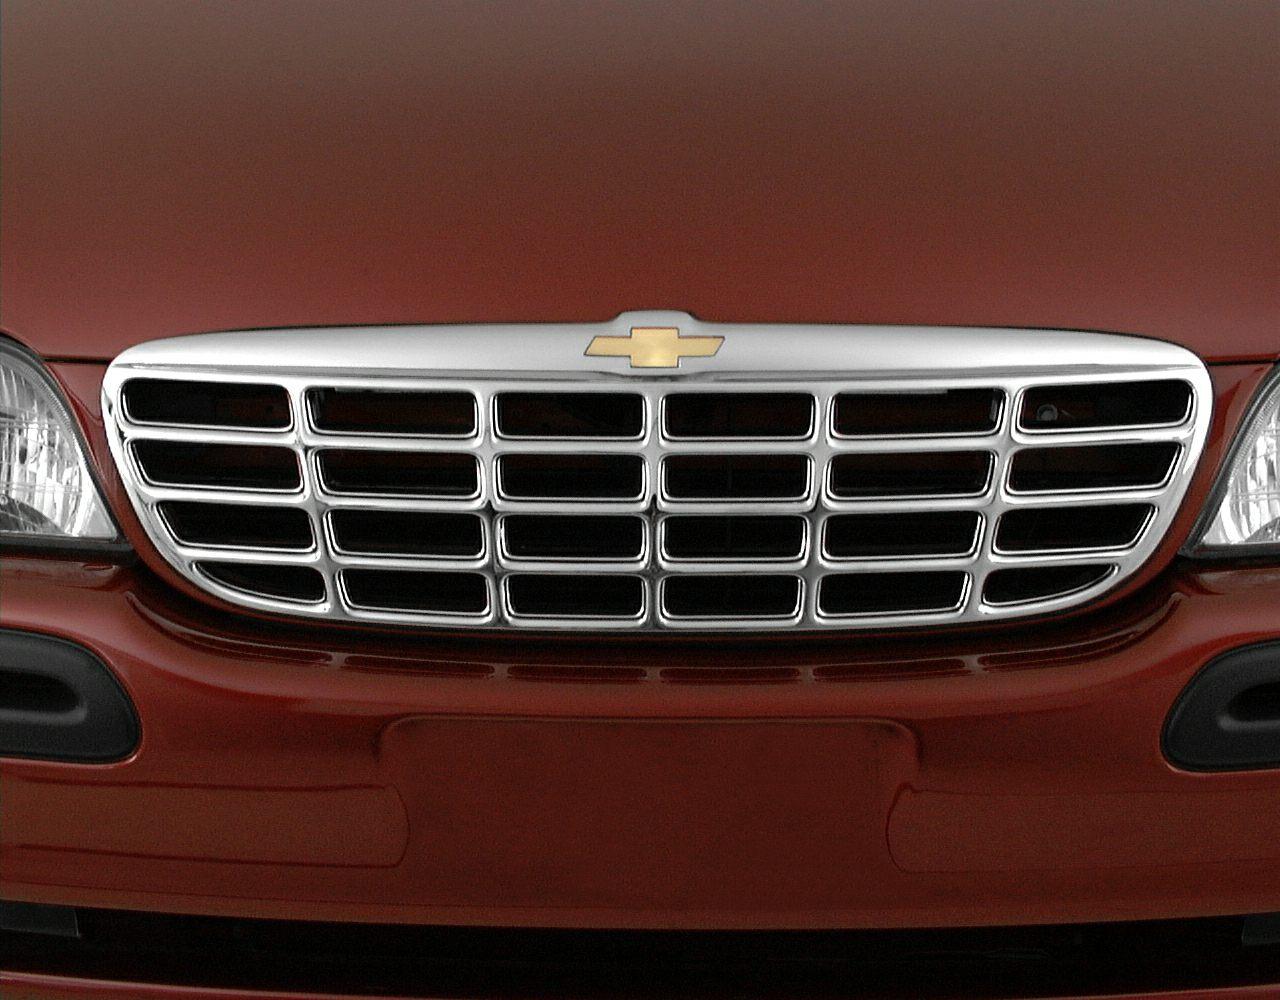 2000 Chevrolet Venture Exterior Photo